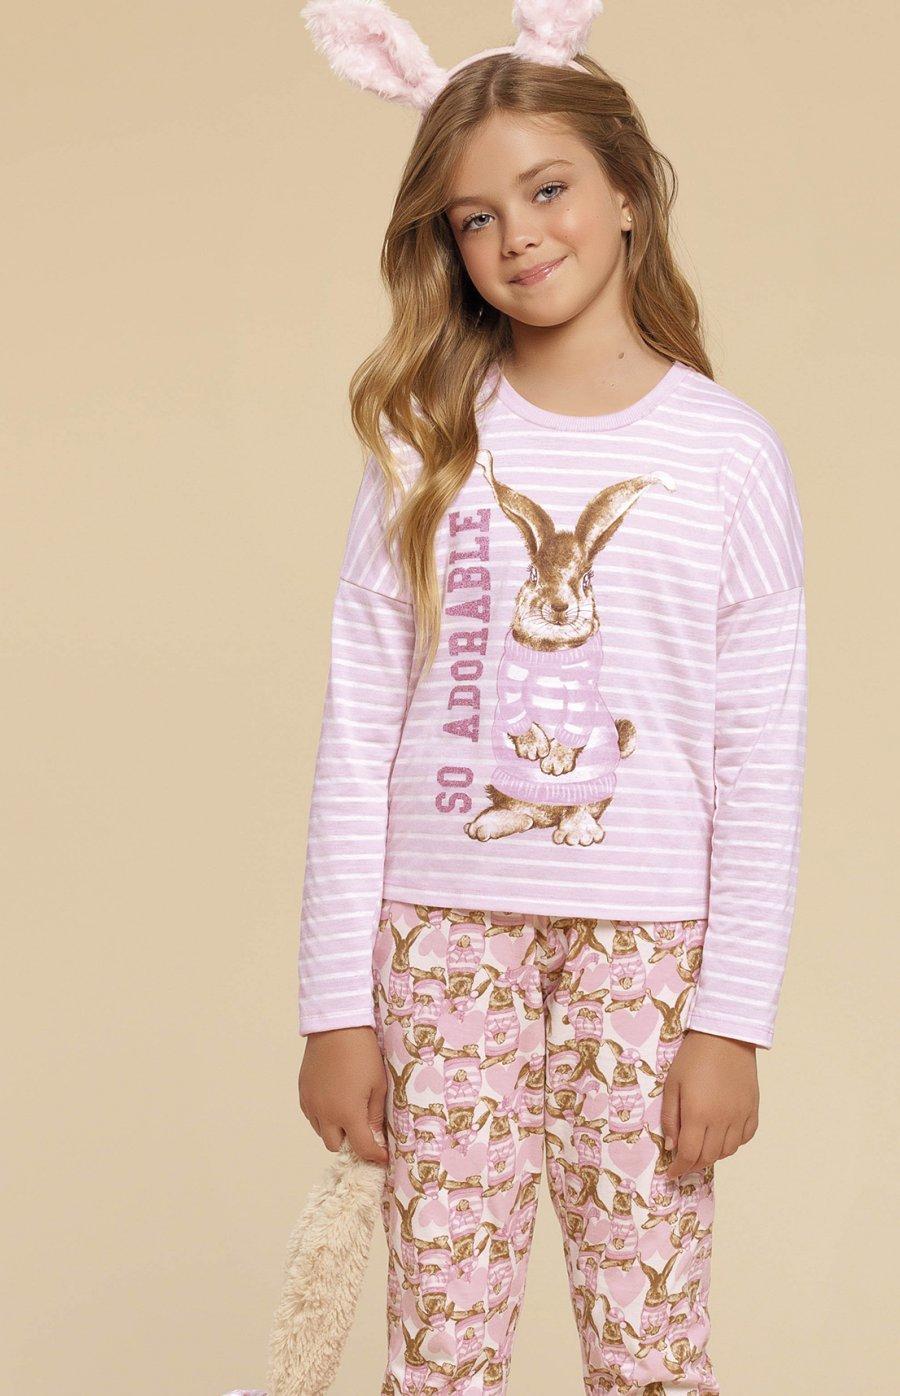 Pijama Infantil Miguxo Inverno 2019 CLOUD CLUB